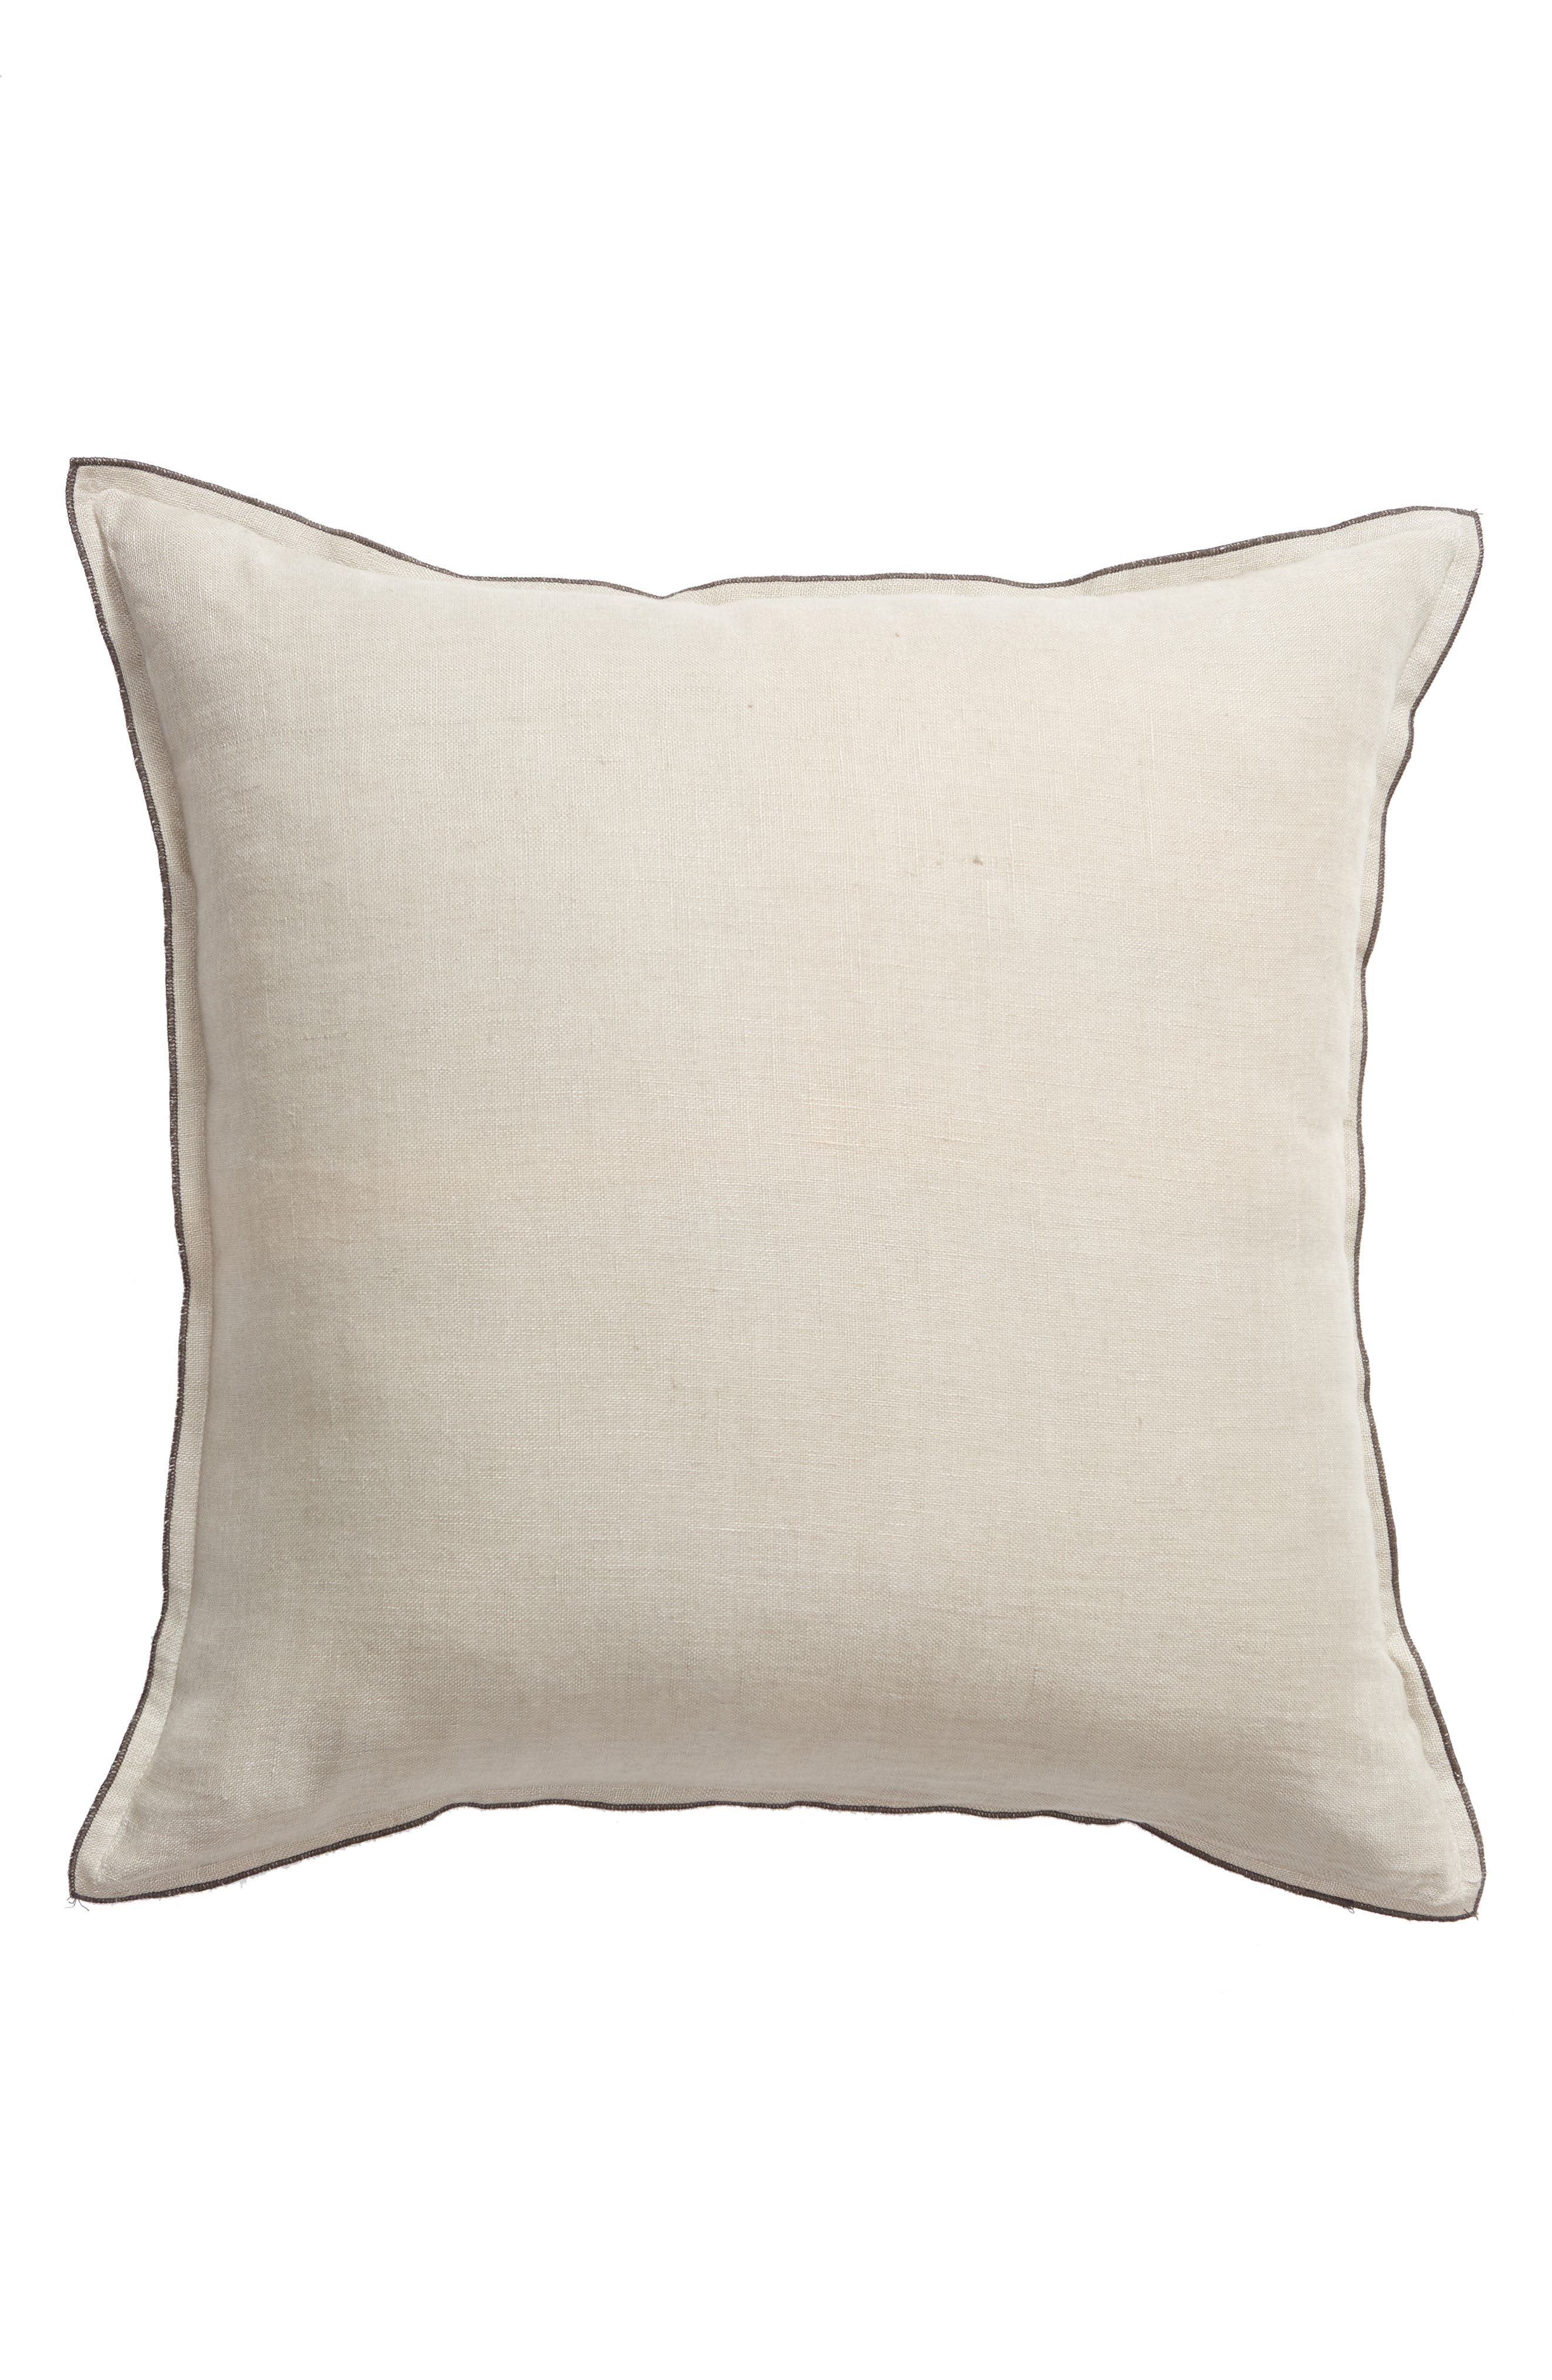 Linen Accent Pillow, Main, color, GREY OWL